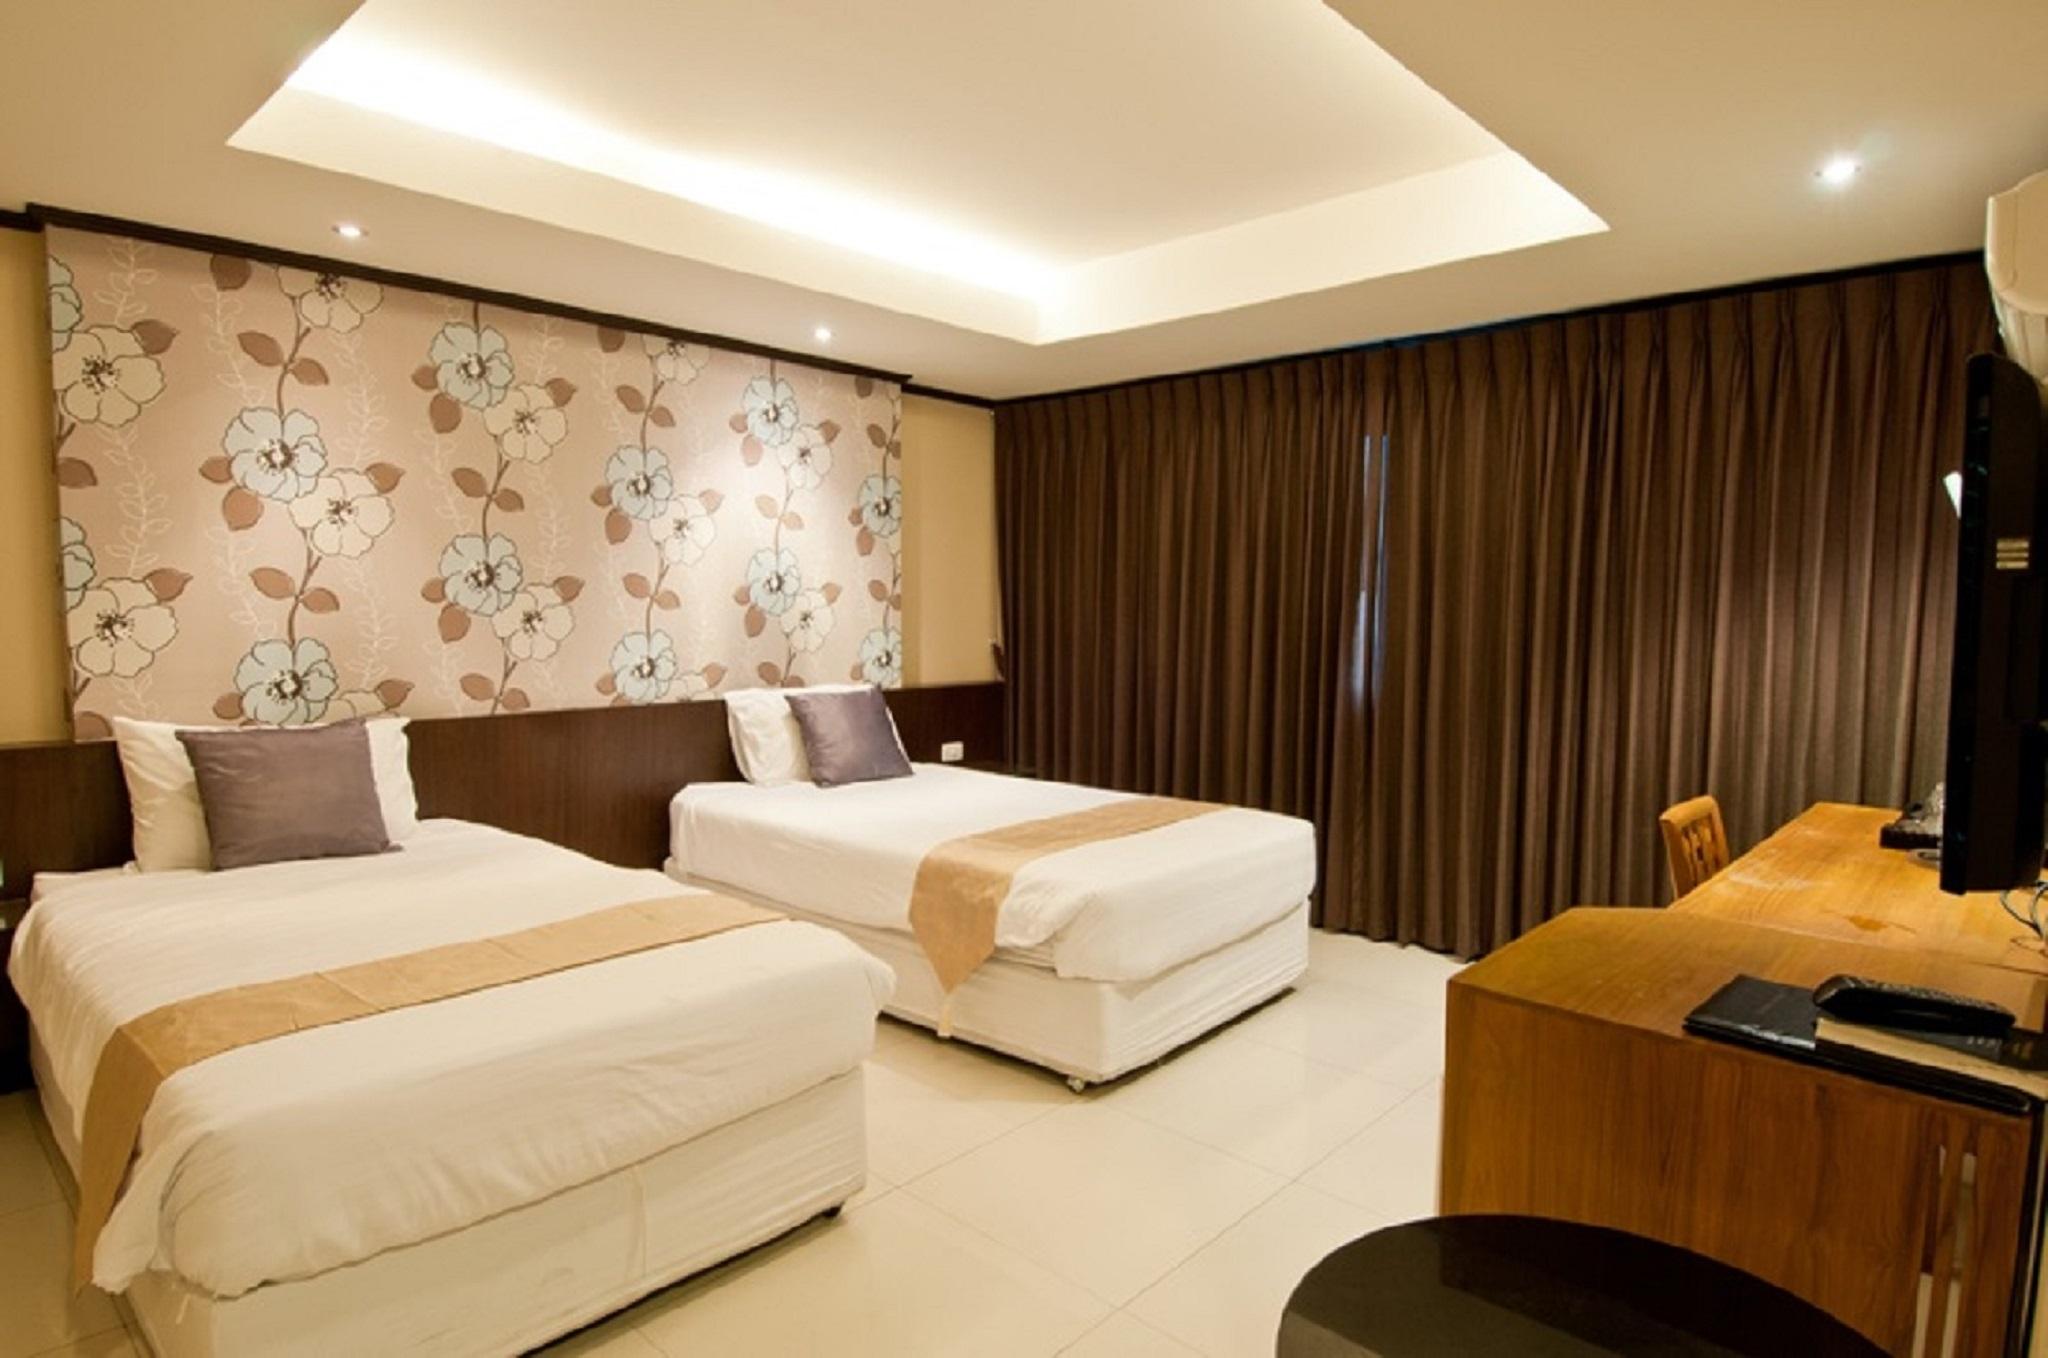 A2 (Formerly Avana Residence), Bang Na